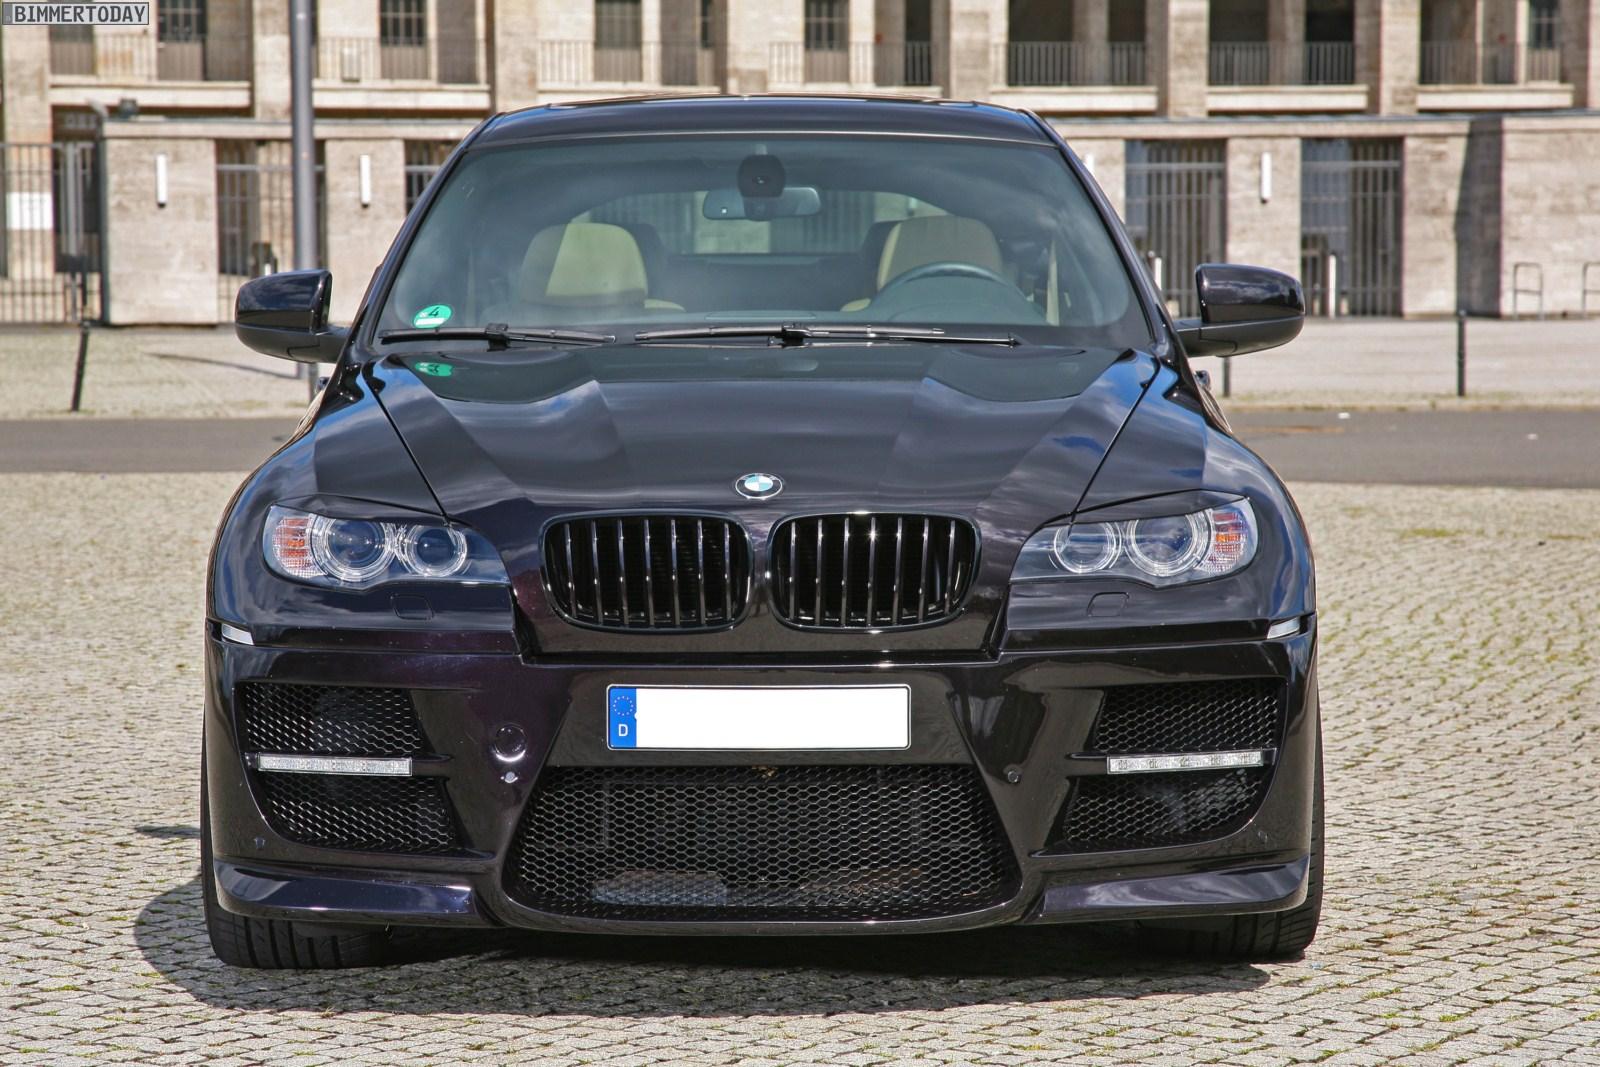 BMW X6 Widebody Kit CLP Bruiser 17